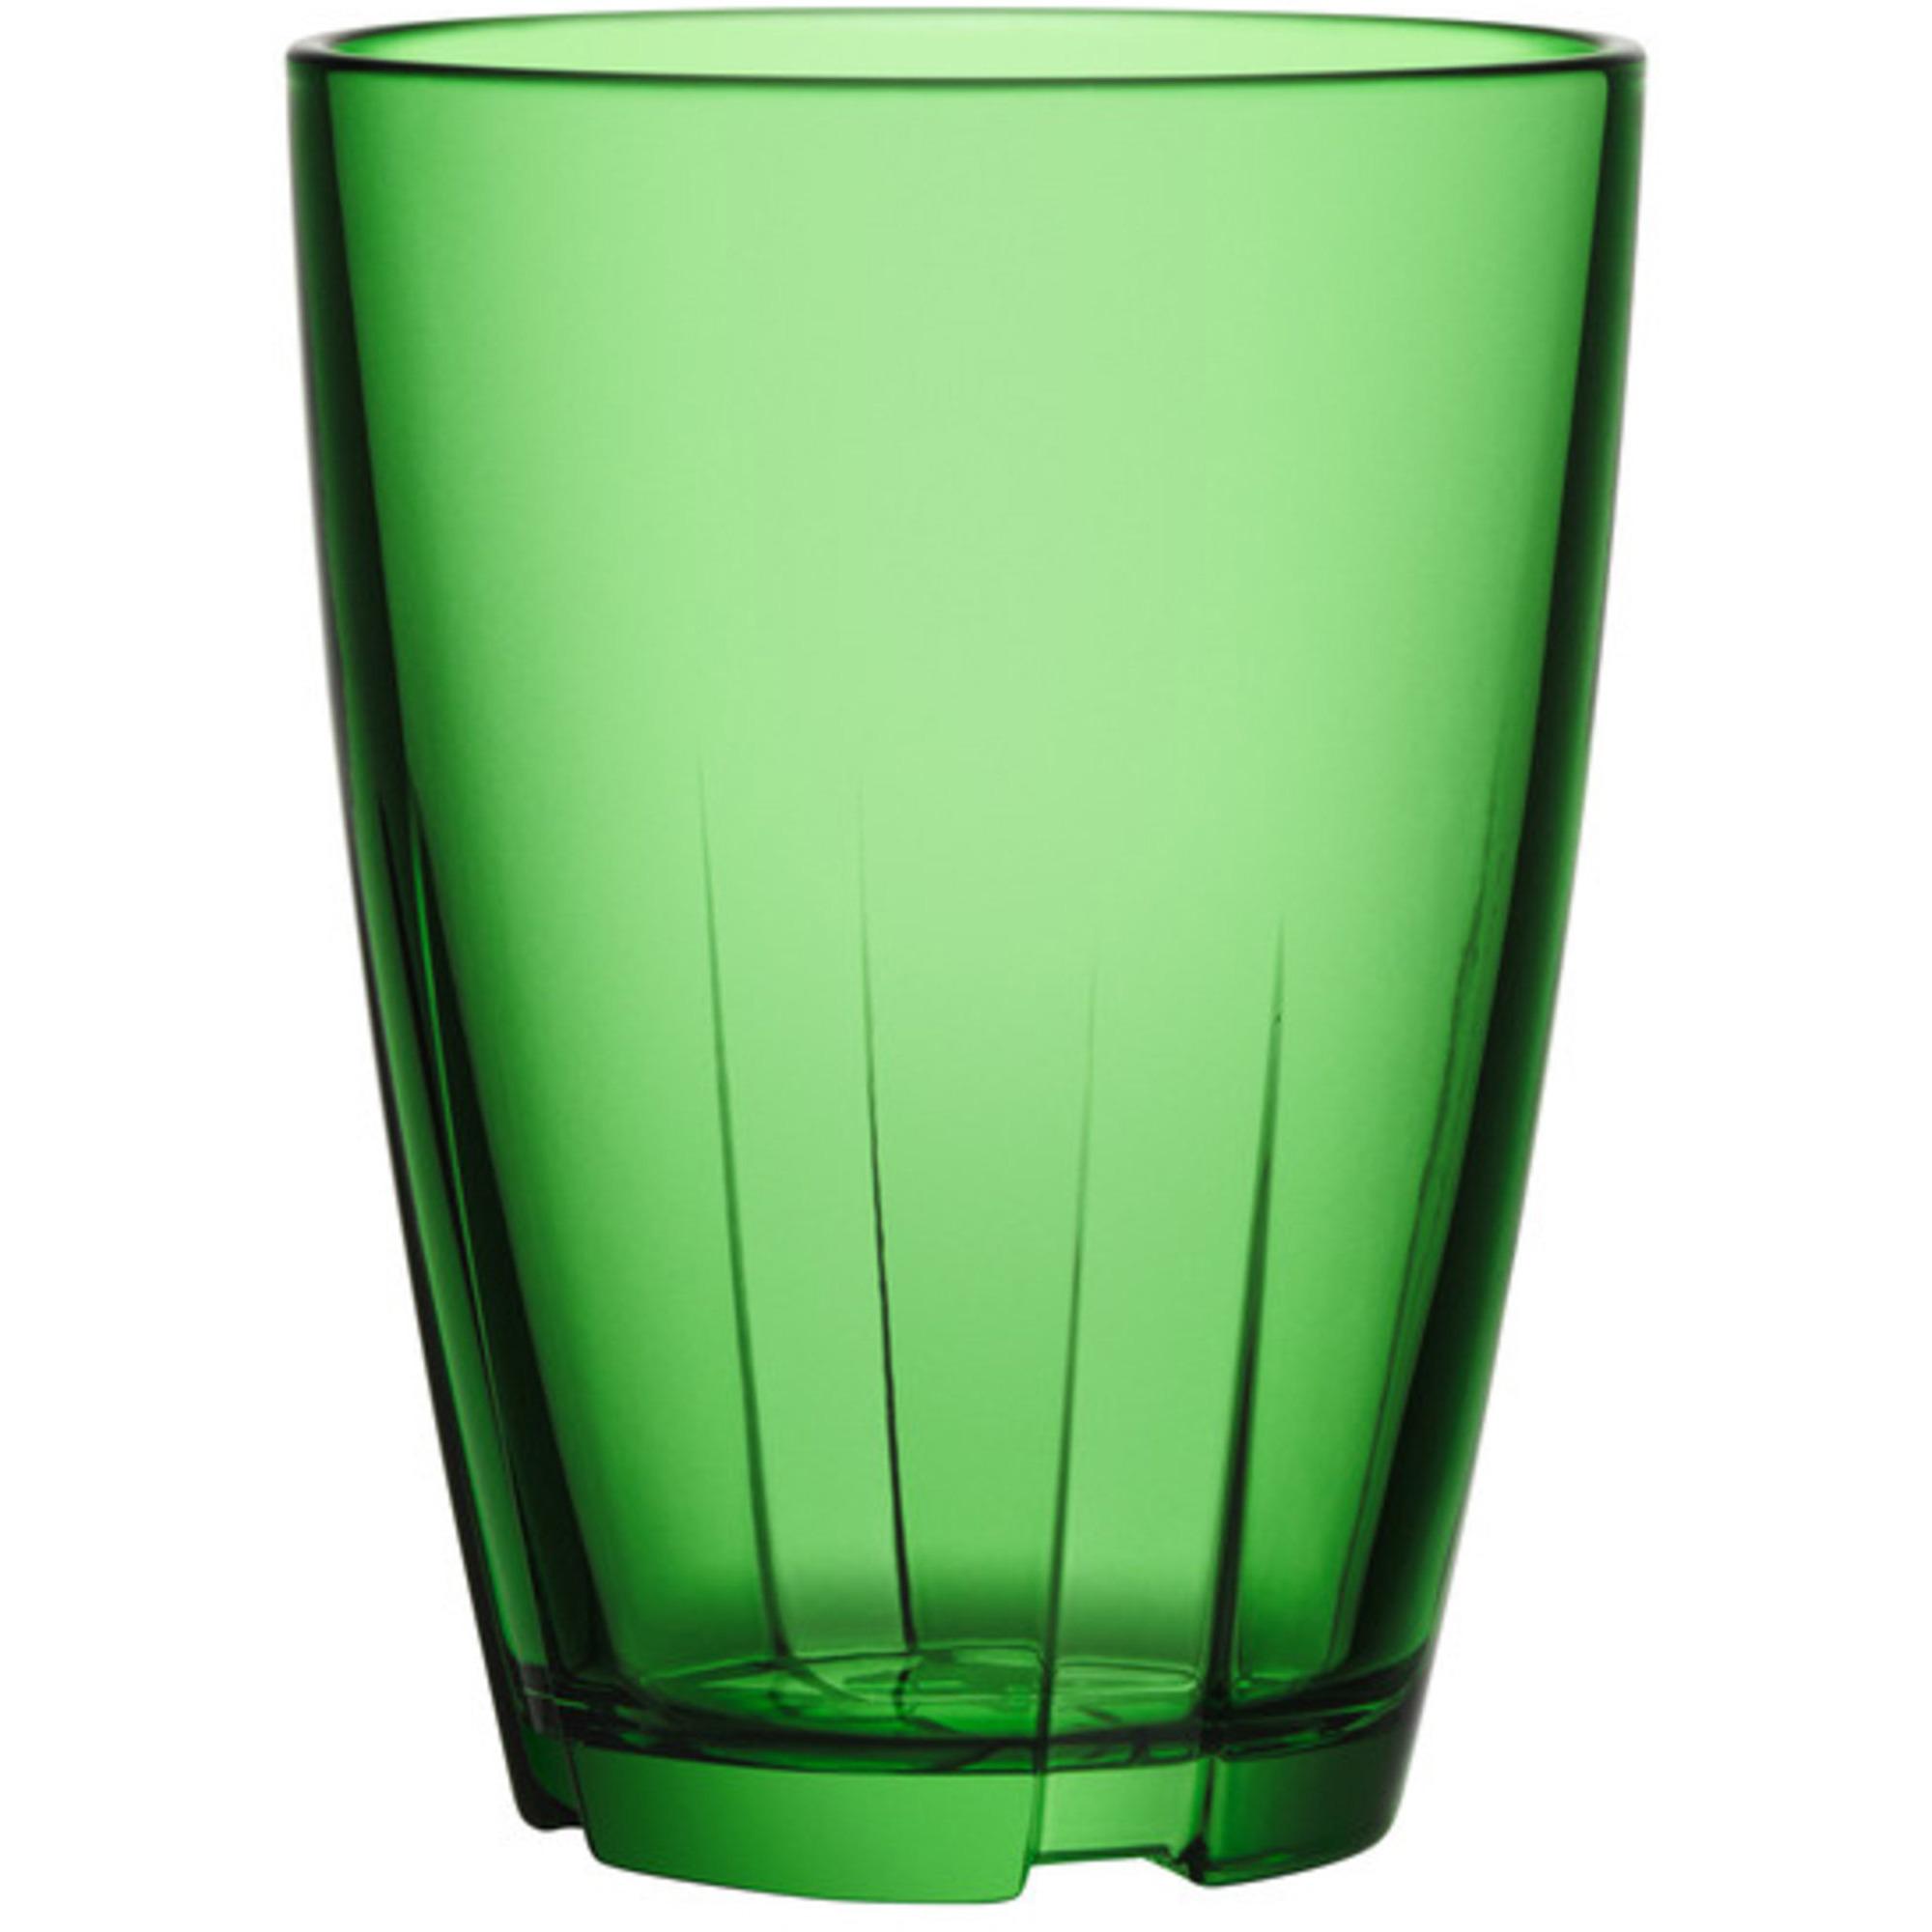 Kosta Boda Bruk Tumblerglas Grön Stort